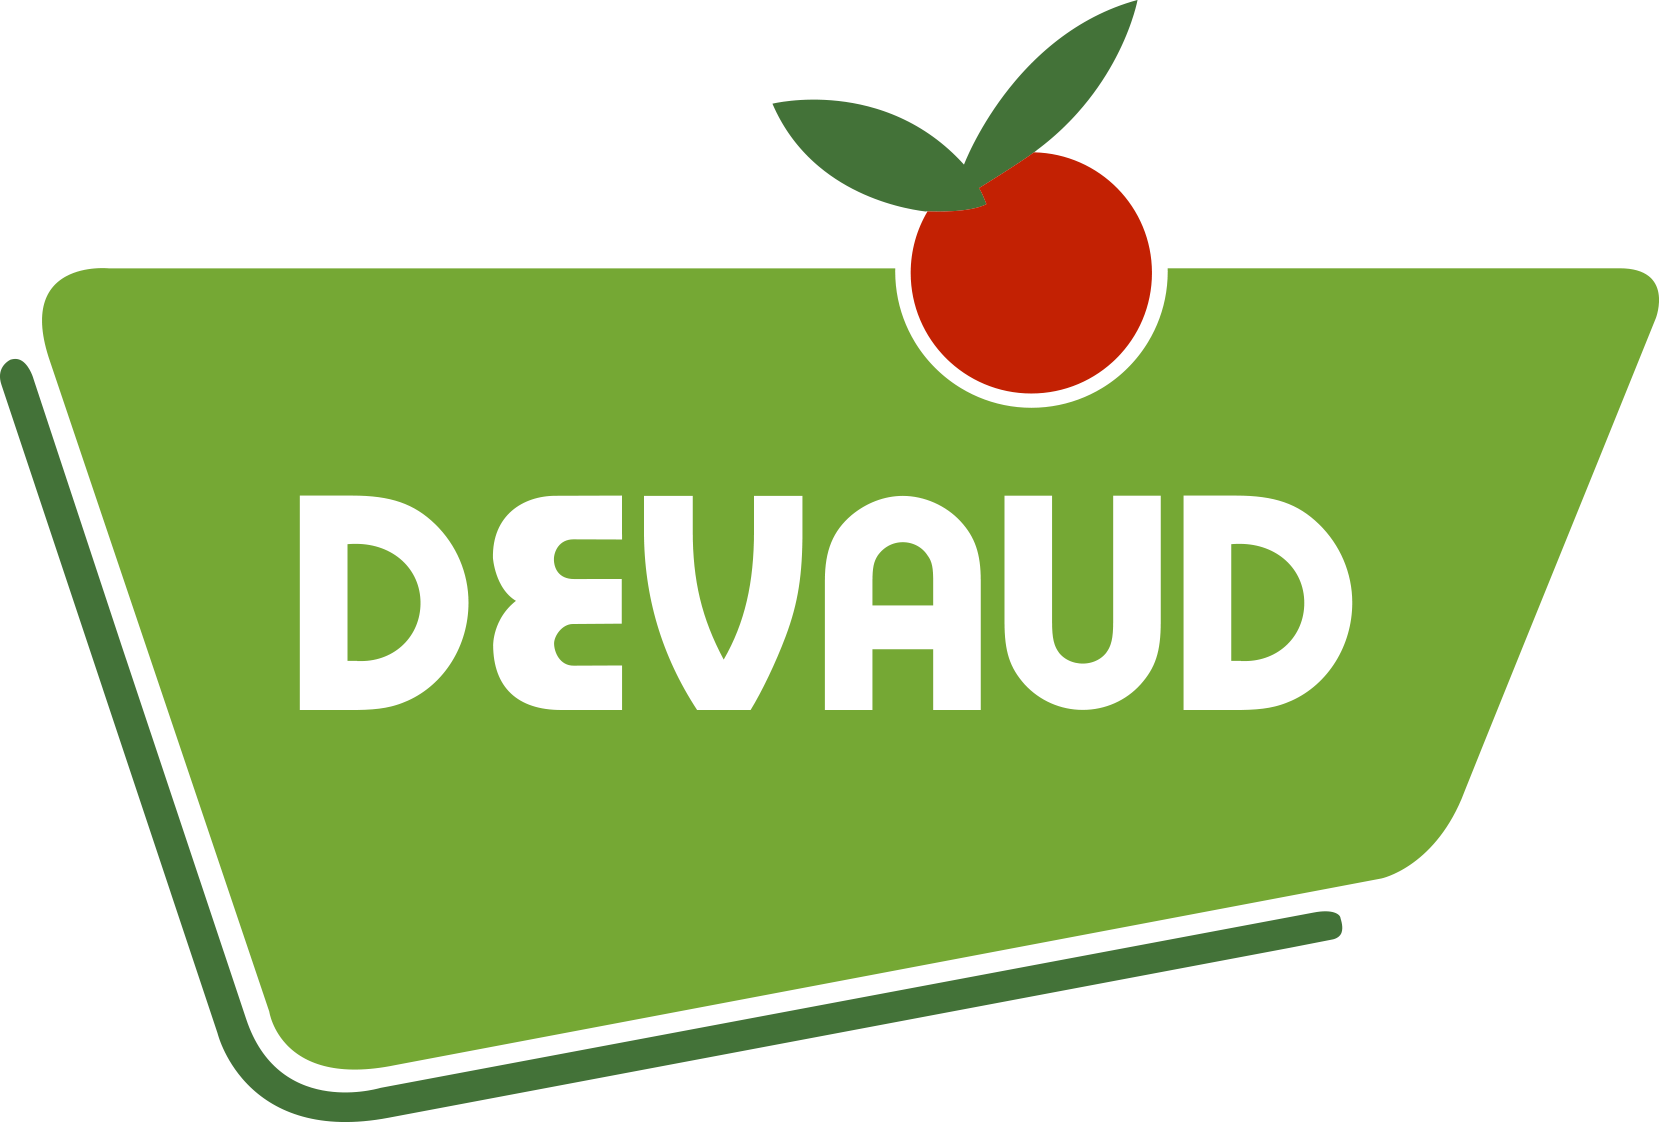 Devaud_RVB